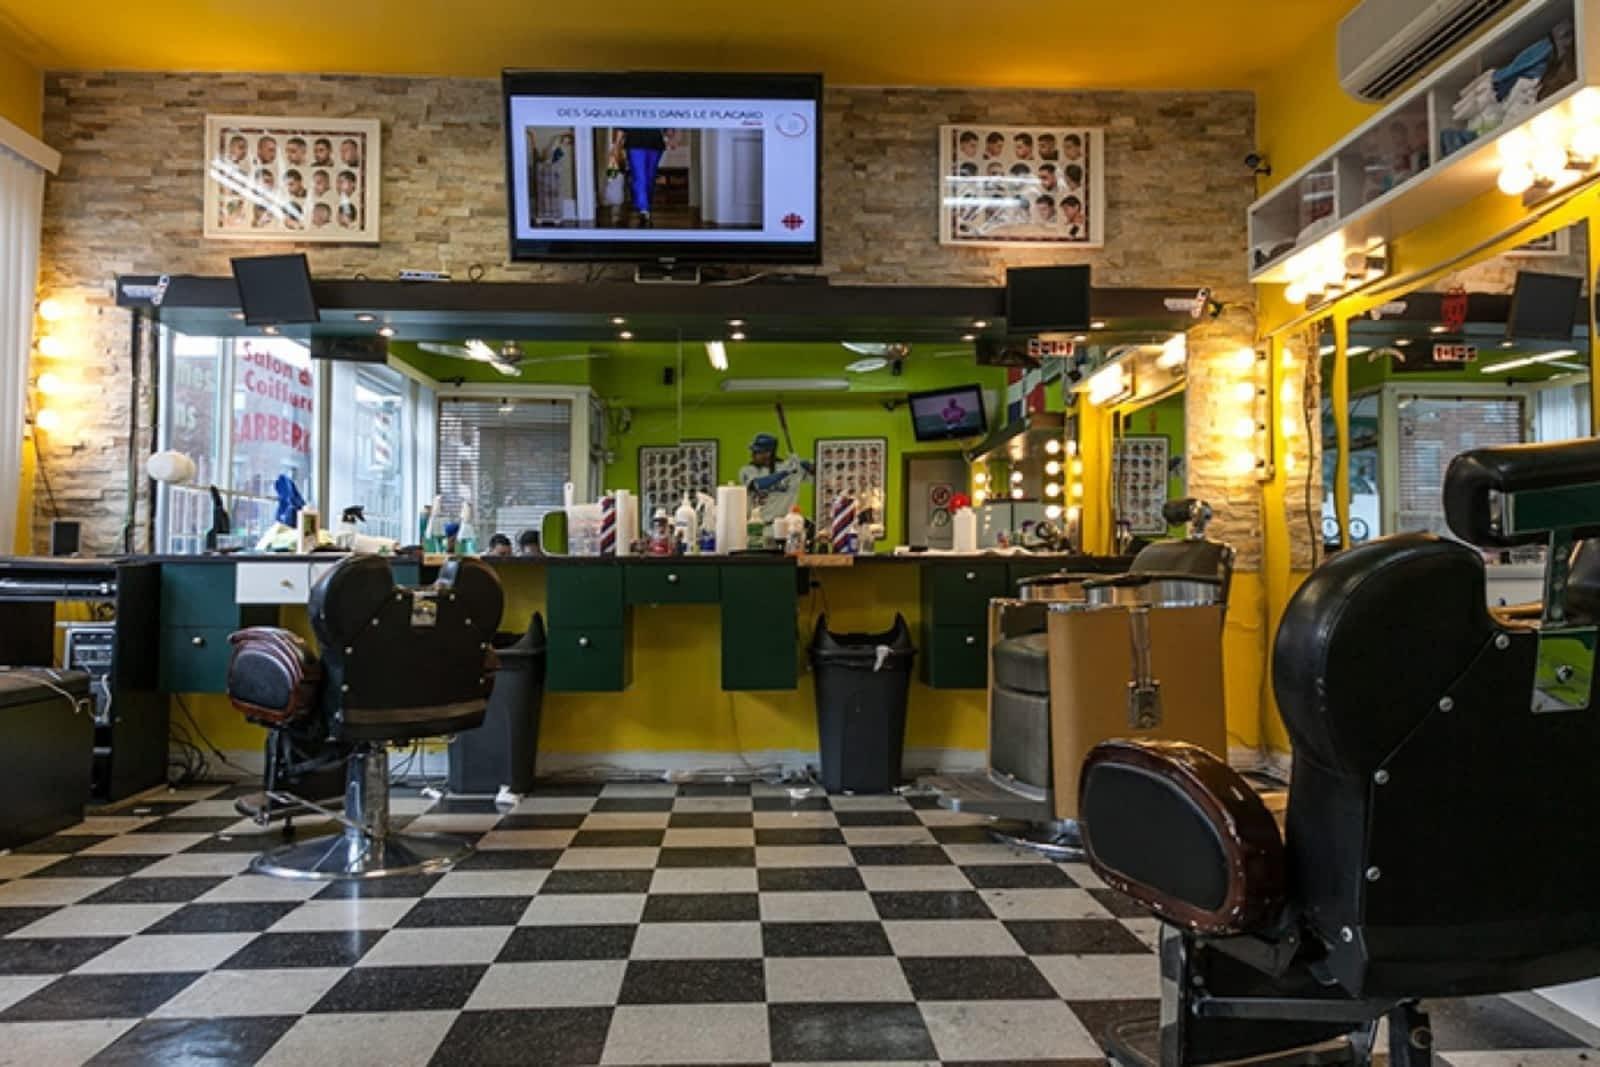 Salon De Coiffure Barberito - Opening Hours - 56, rue Beaubien E ...